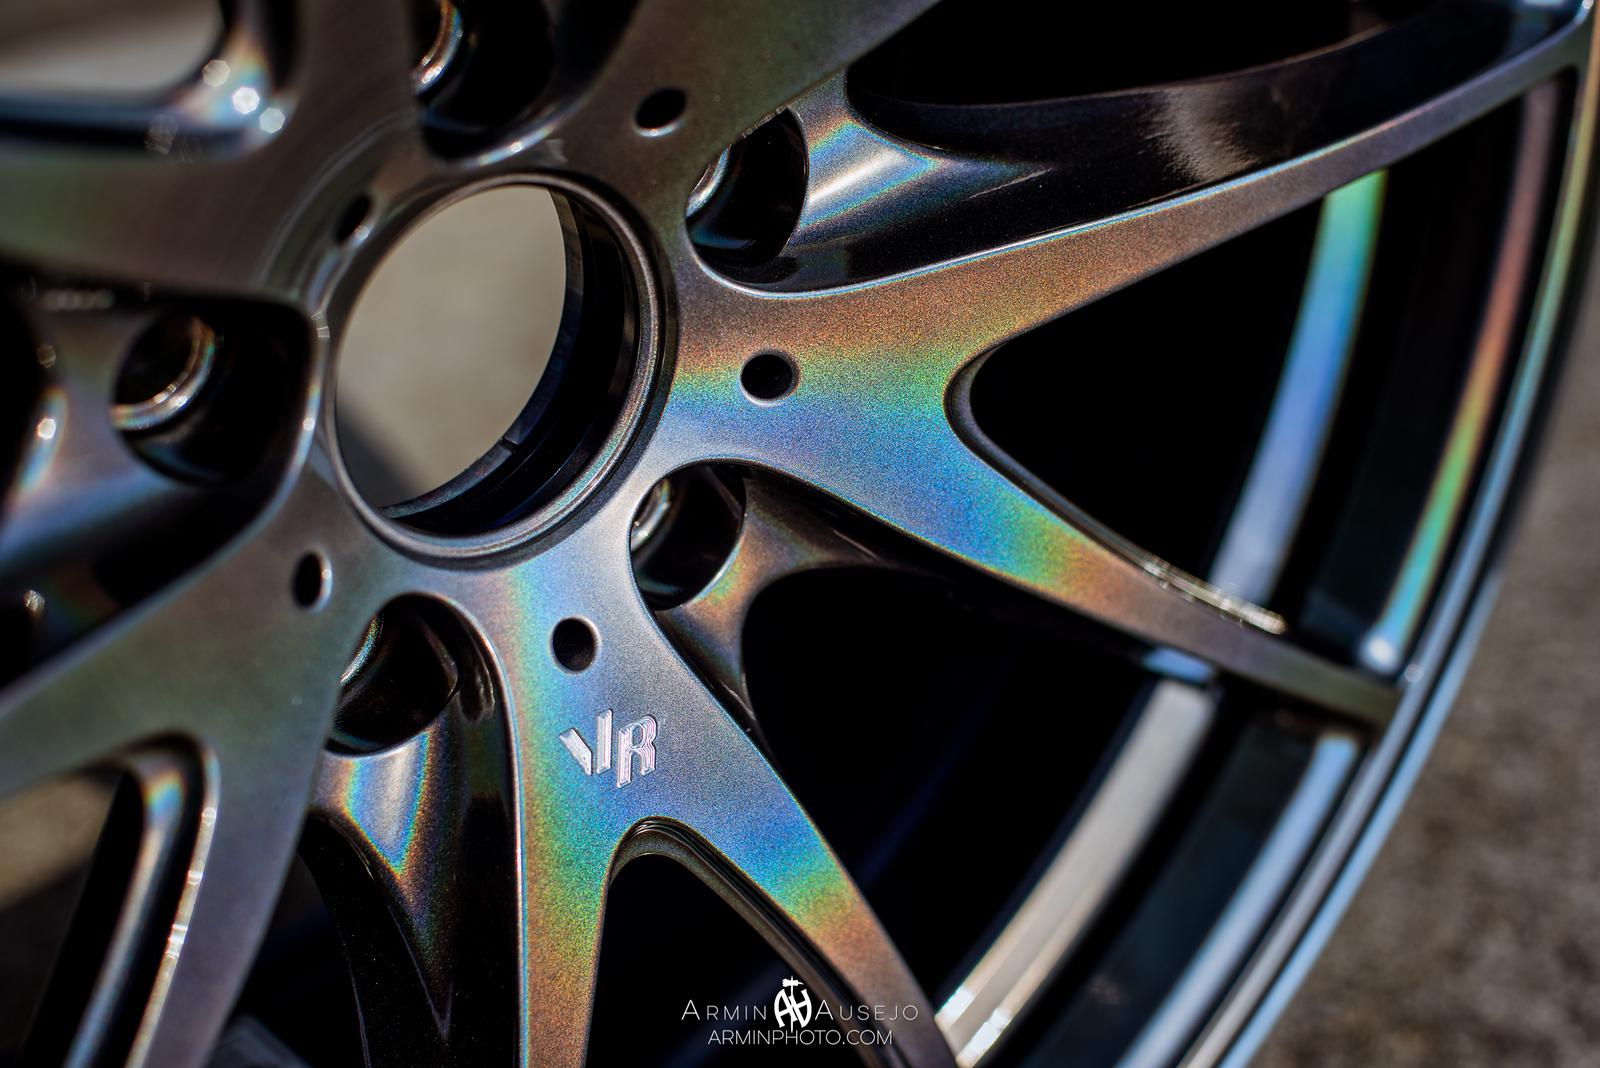 Volk Racing G25 in Dark Prism Close-Up